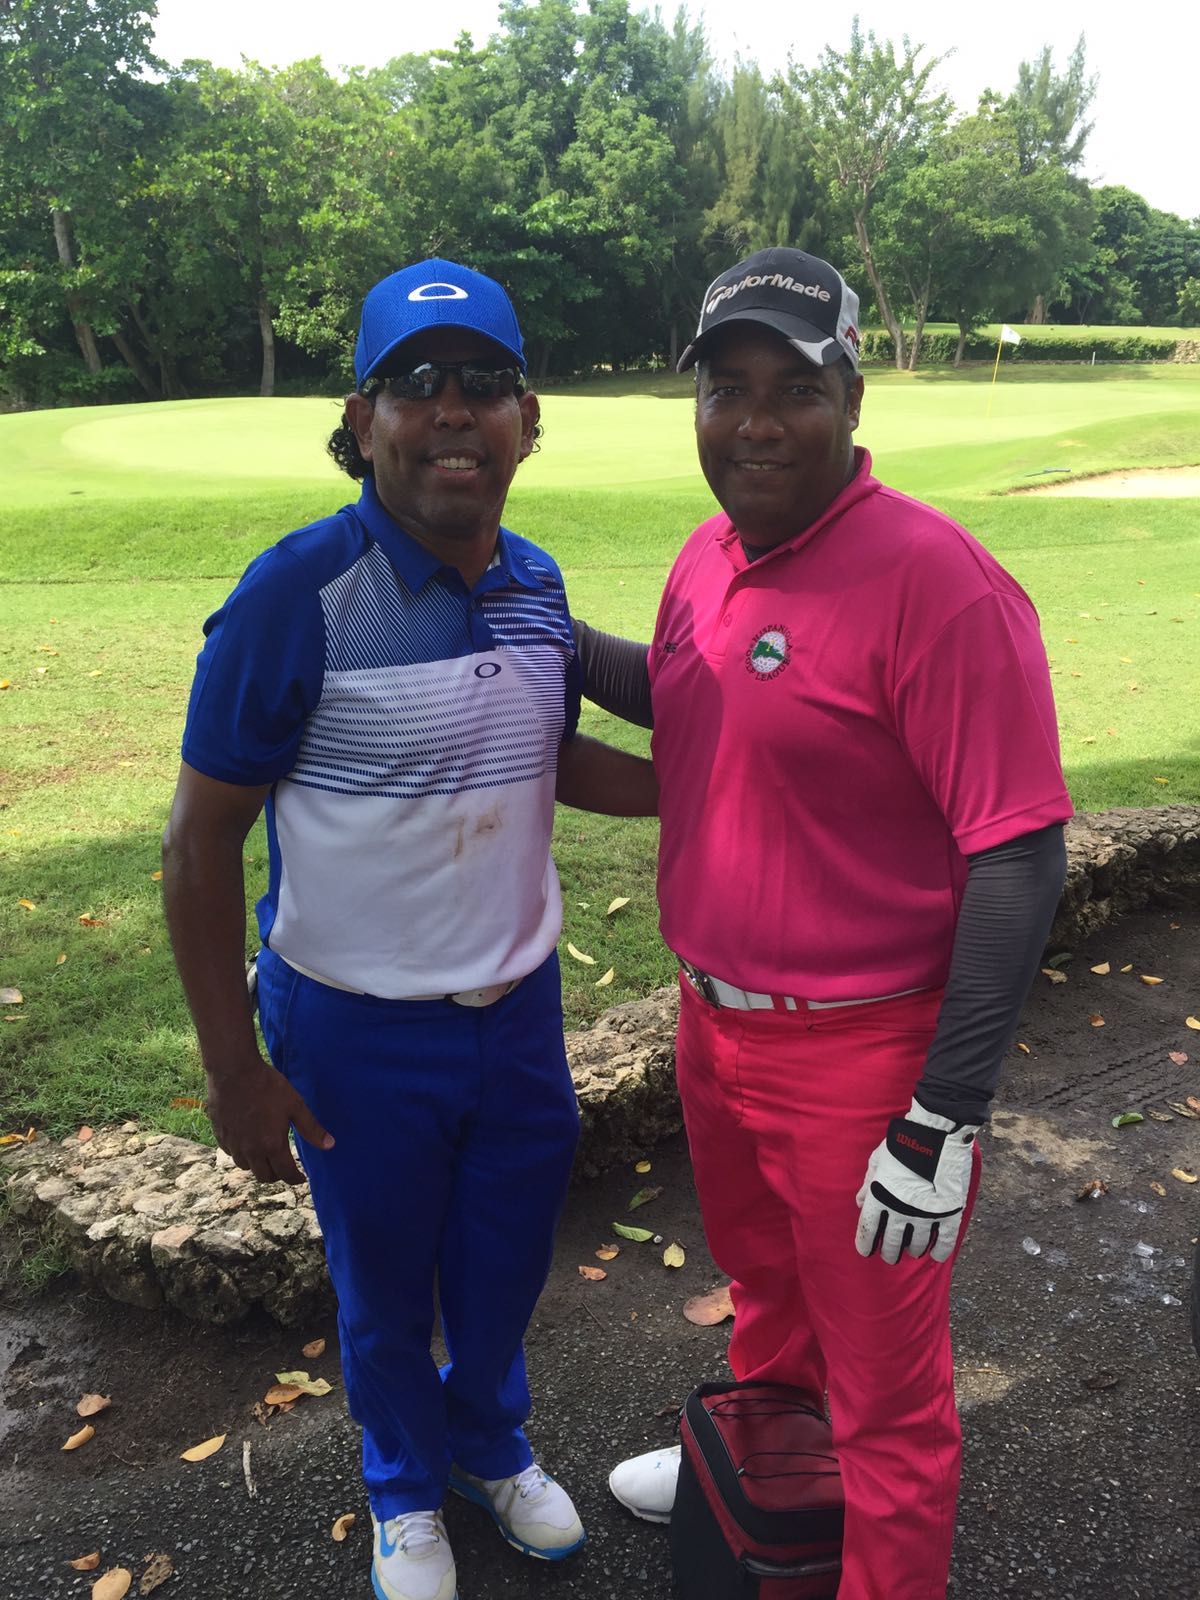 Carlos Cepeda & Jose Rene Suero